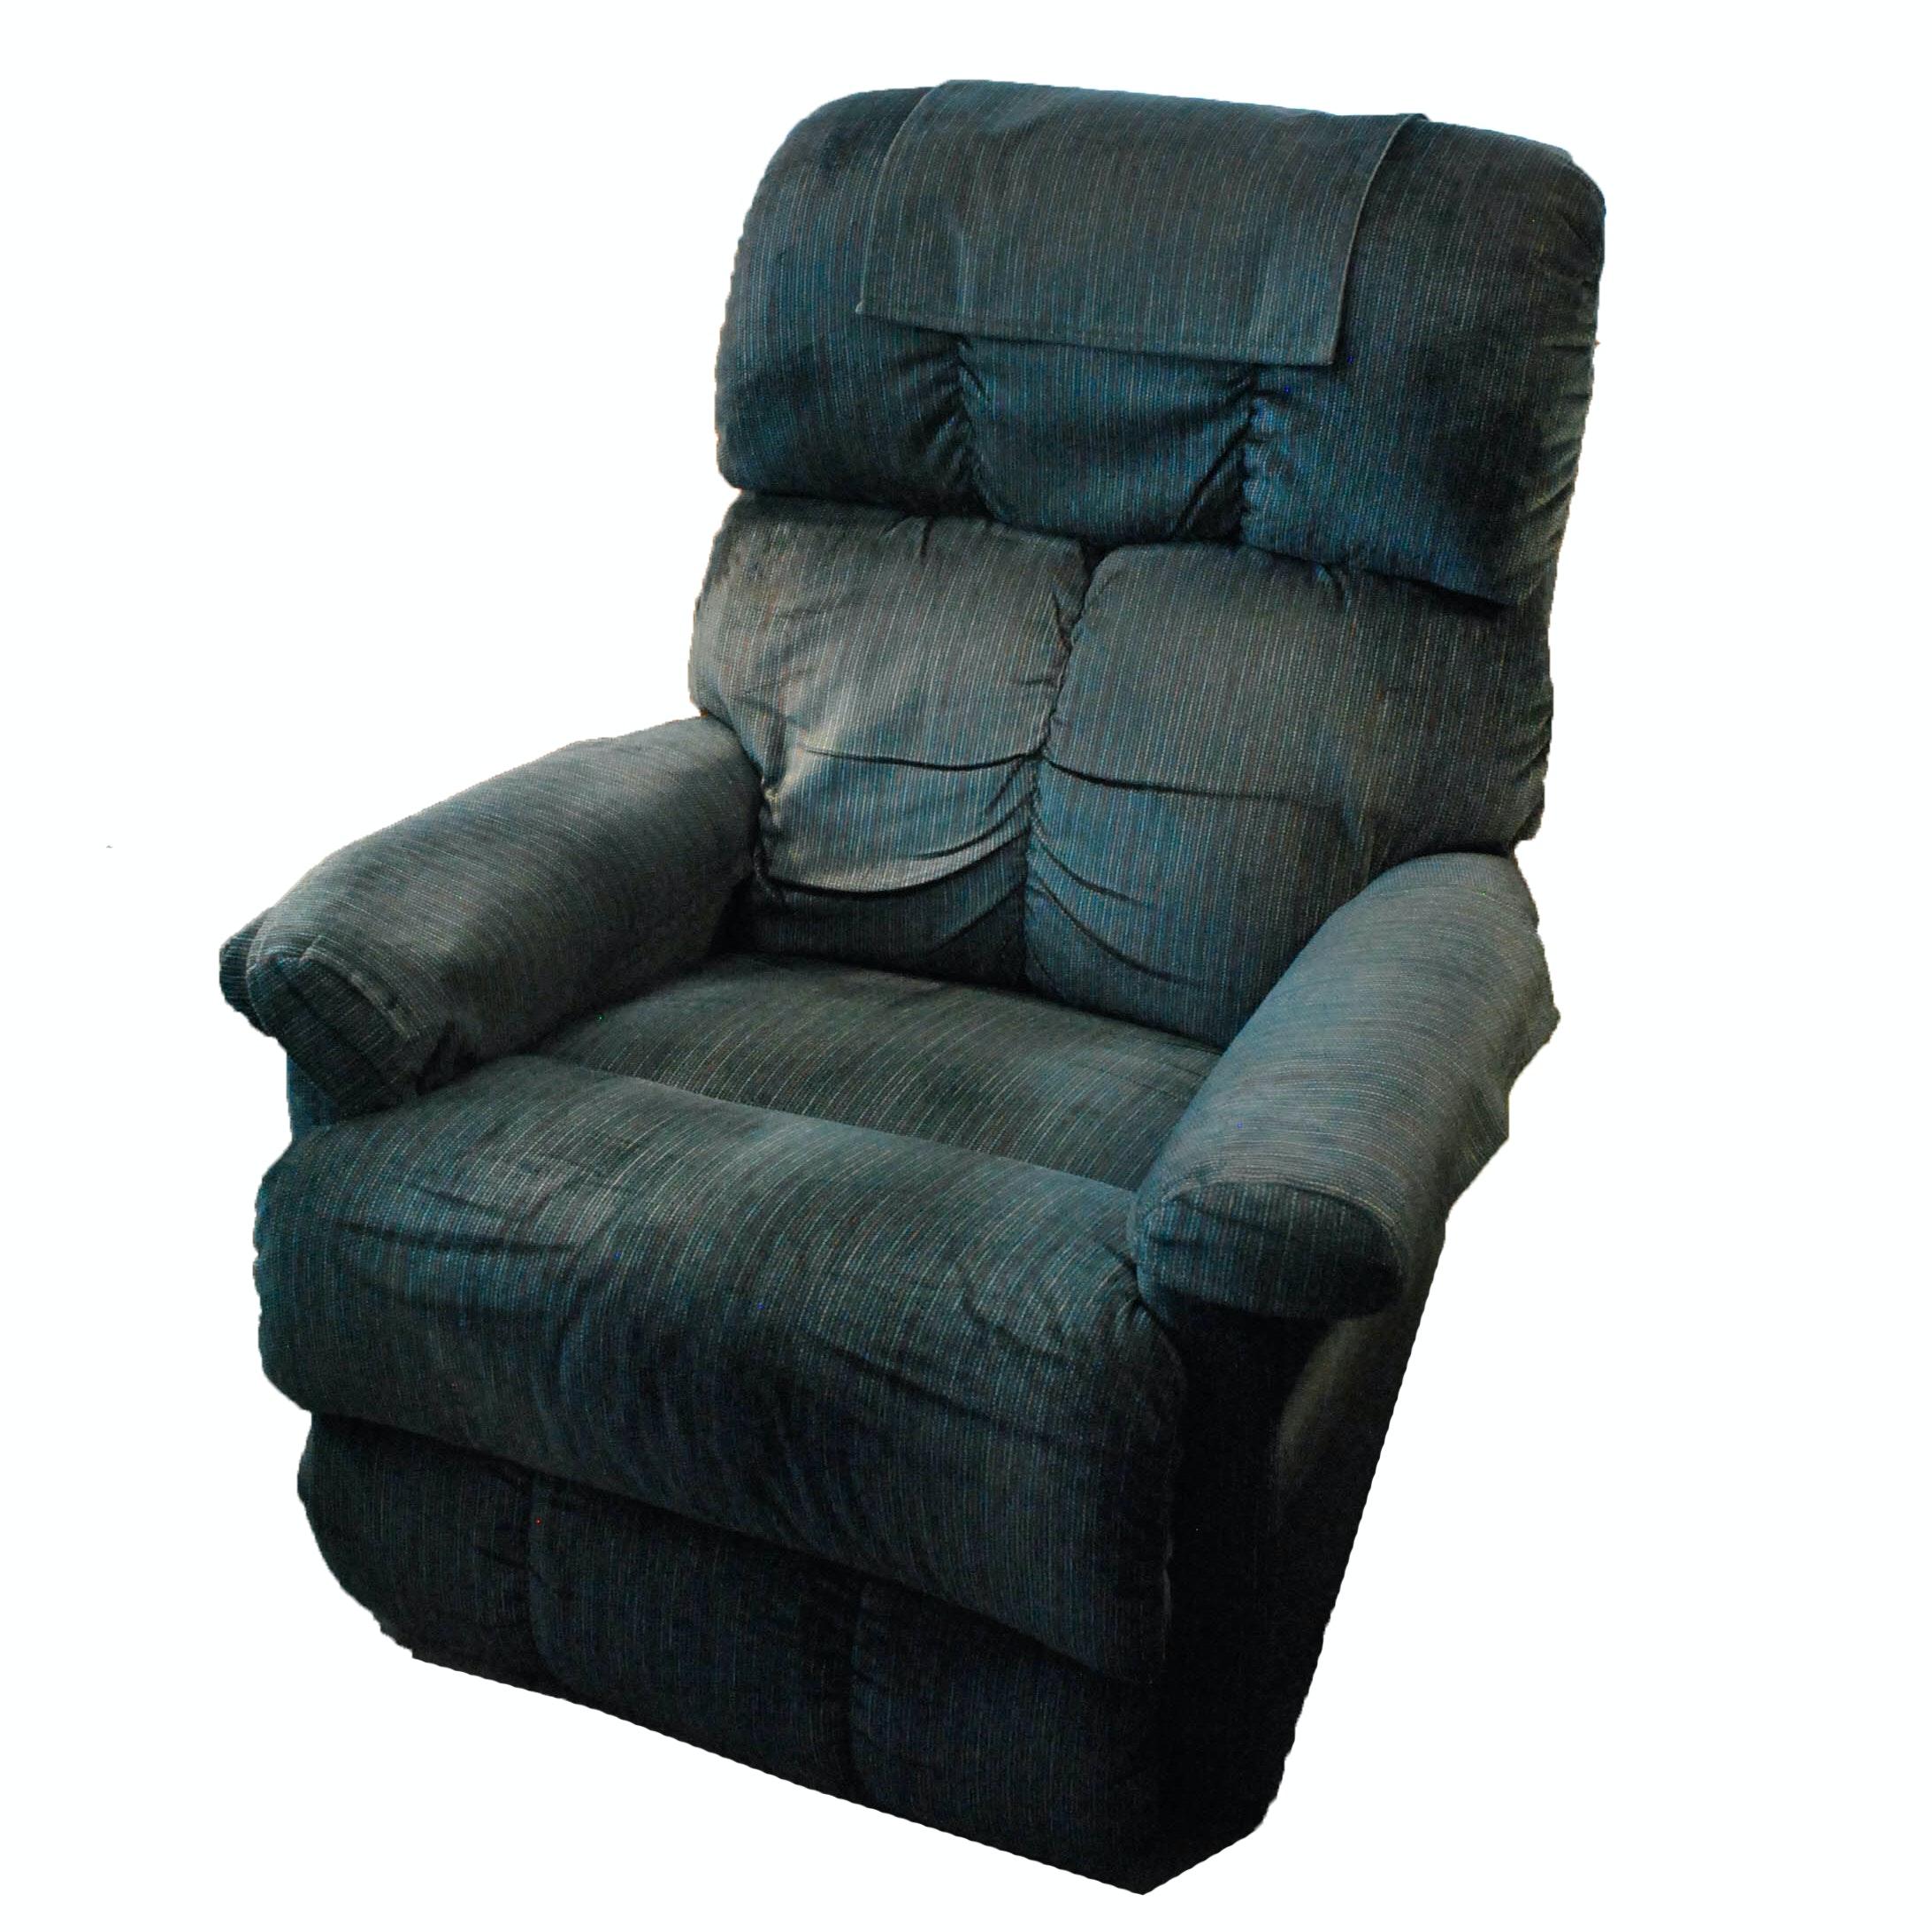 Blue Upholstered Recliner